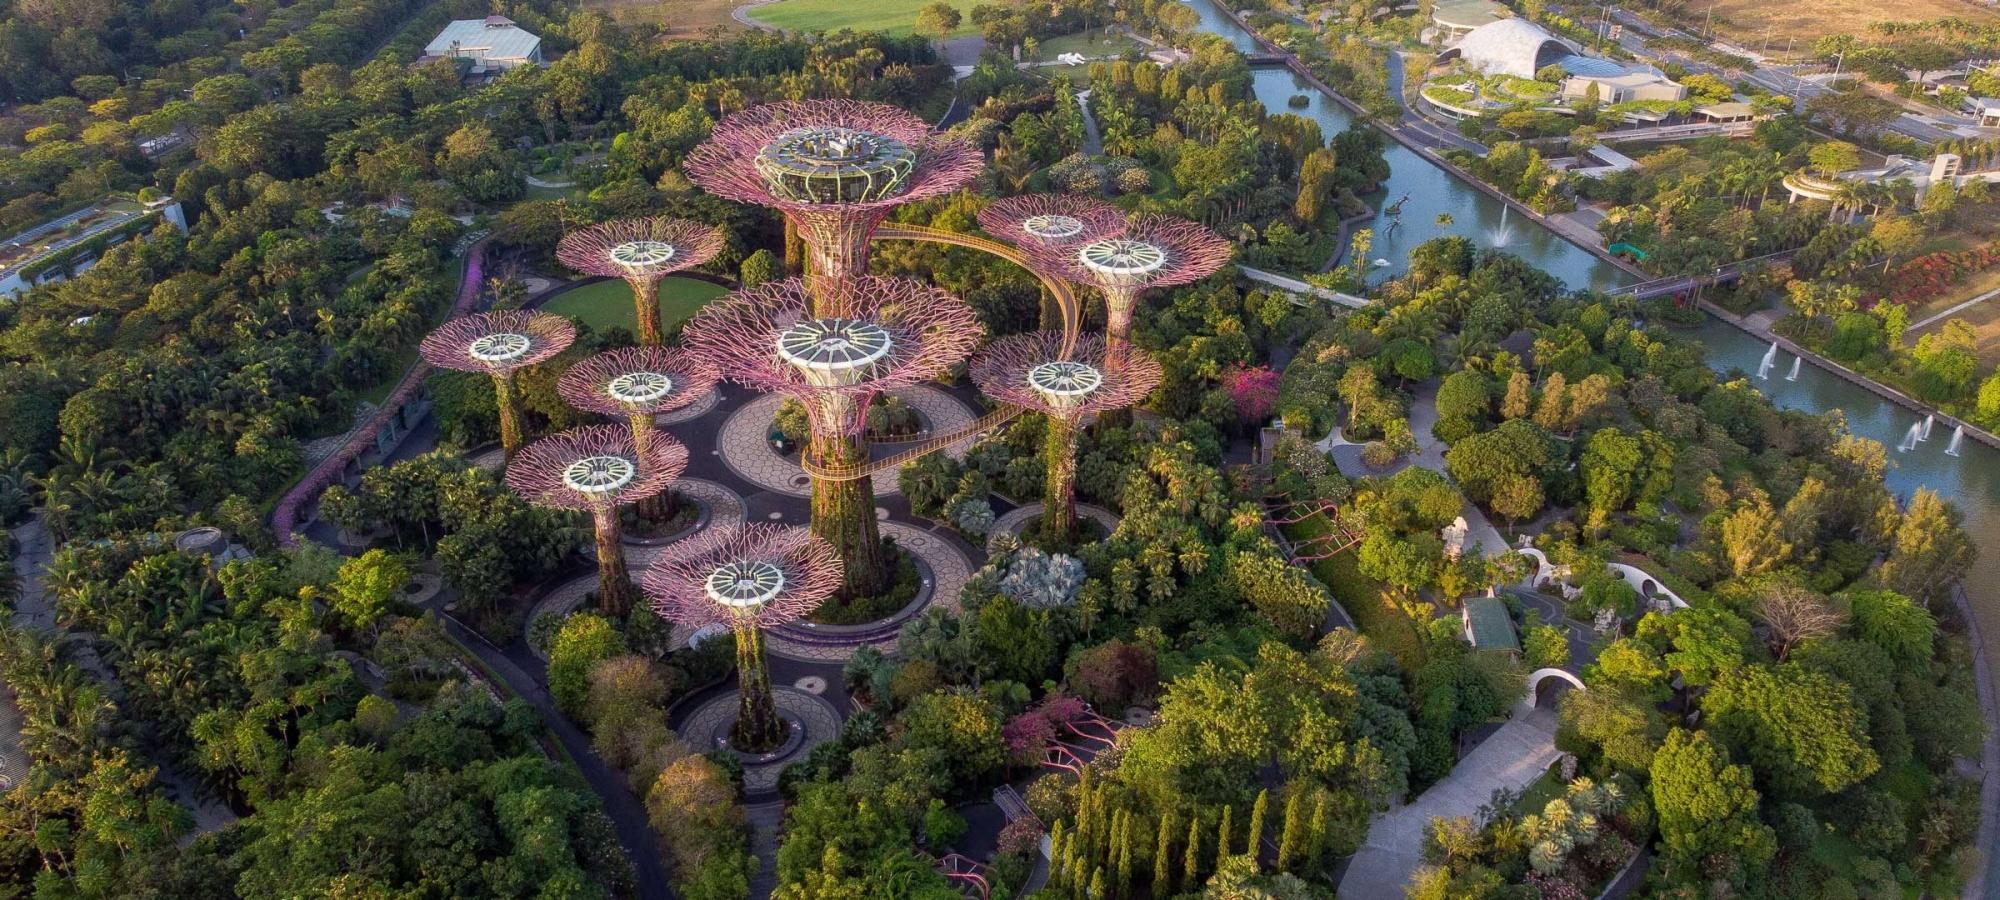 Singaporen Gardens by the bay kuvattuna ilmasta